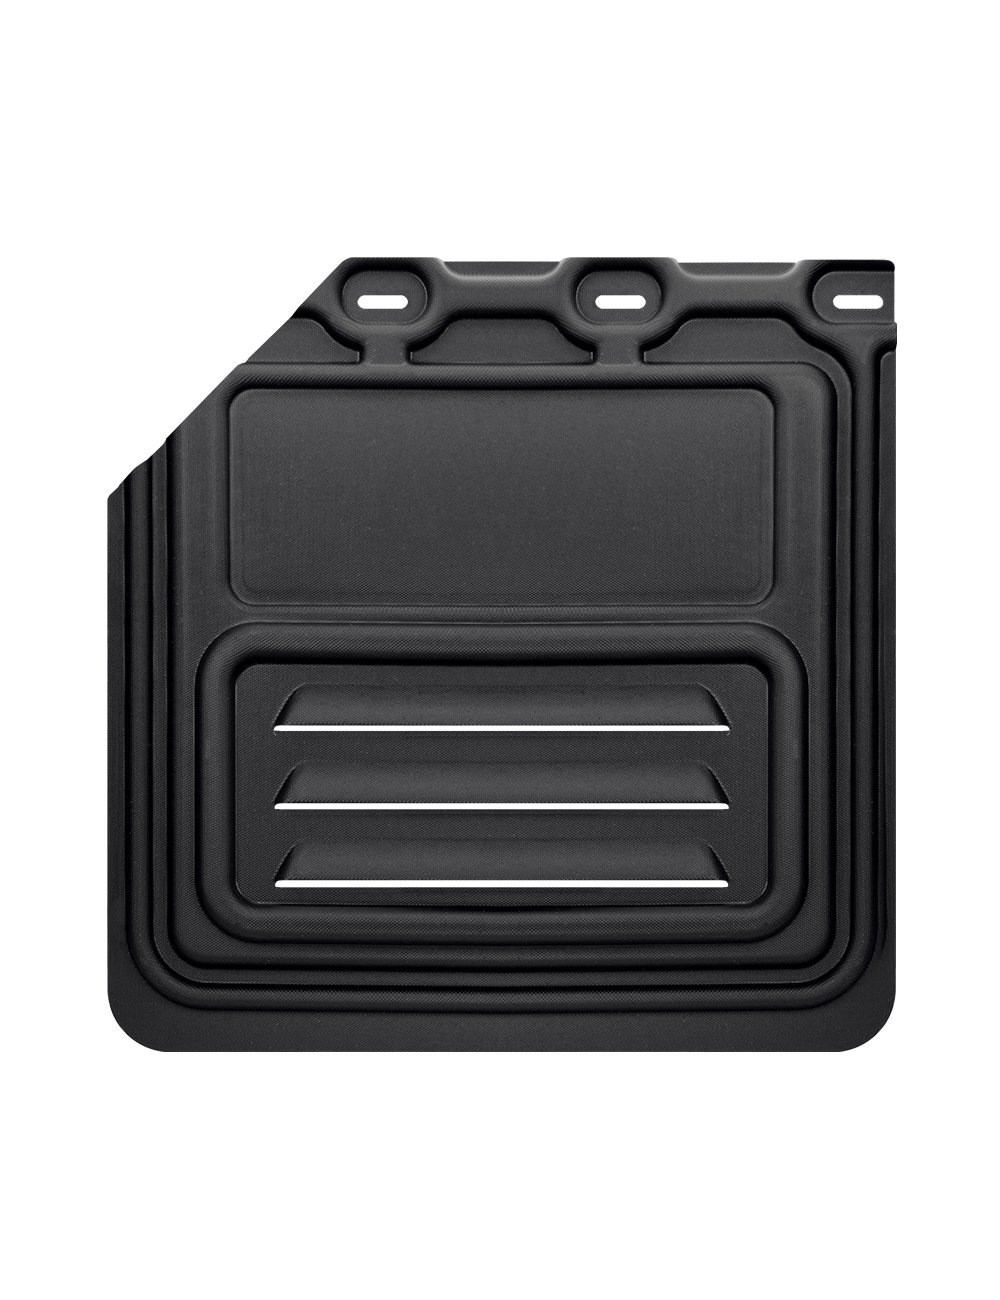 1 Pair Mud Flap for Semi Truck /& Semi Trailer 24 x 24 No Cut Aero HD Black 2 pcs AT Clutches